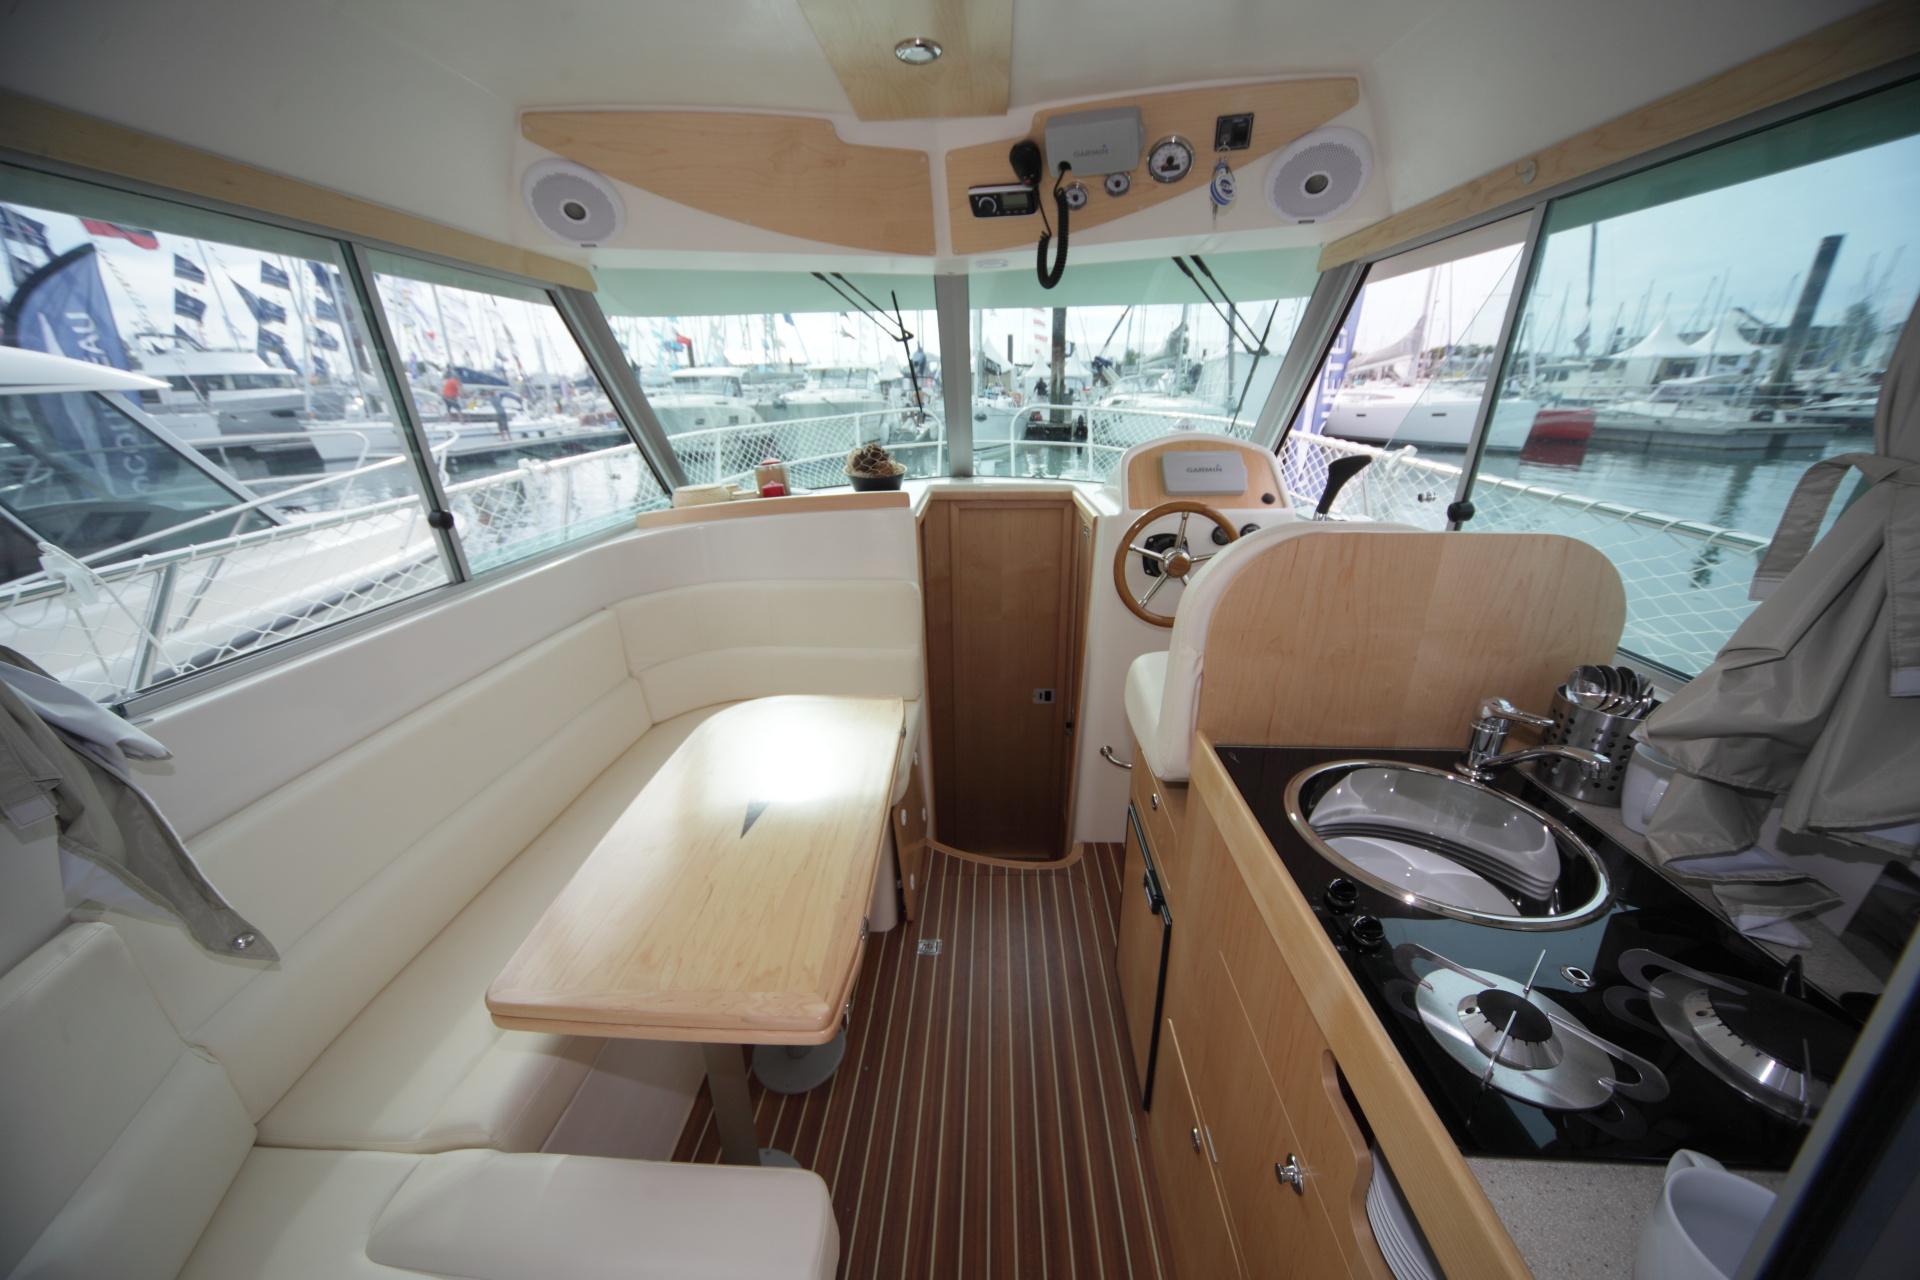 Motorboat ocqueteau range cruiser 885 inboard our range ocqueteau shipyar - Interieur bateau de luxe ...